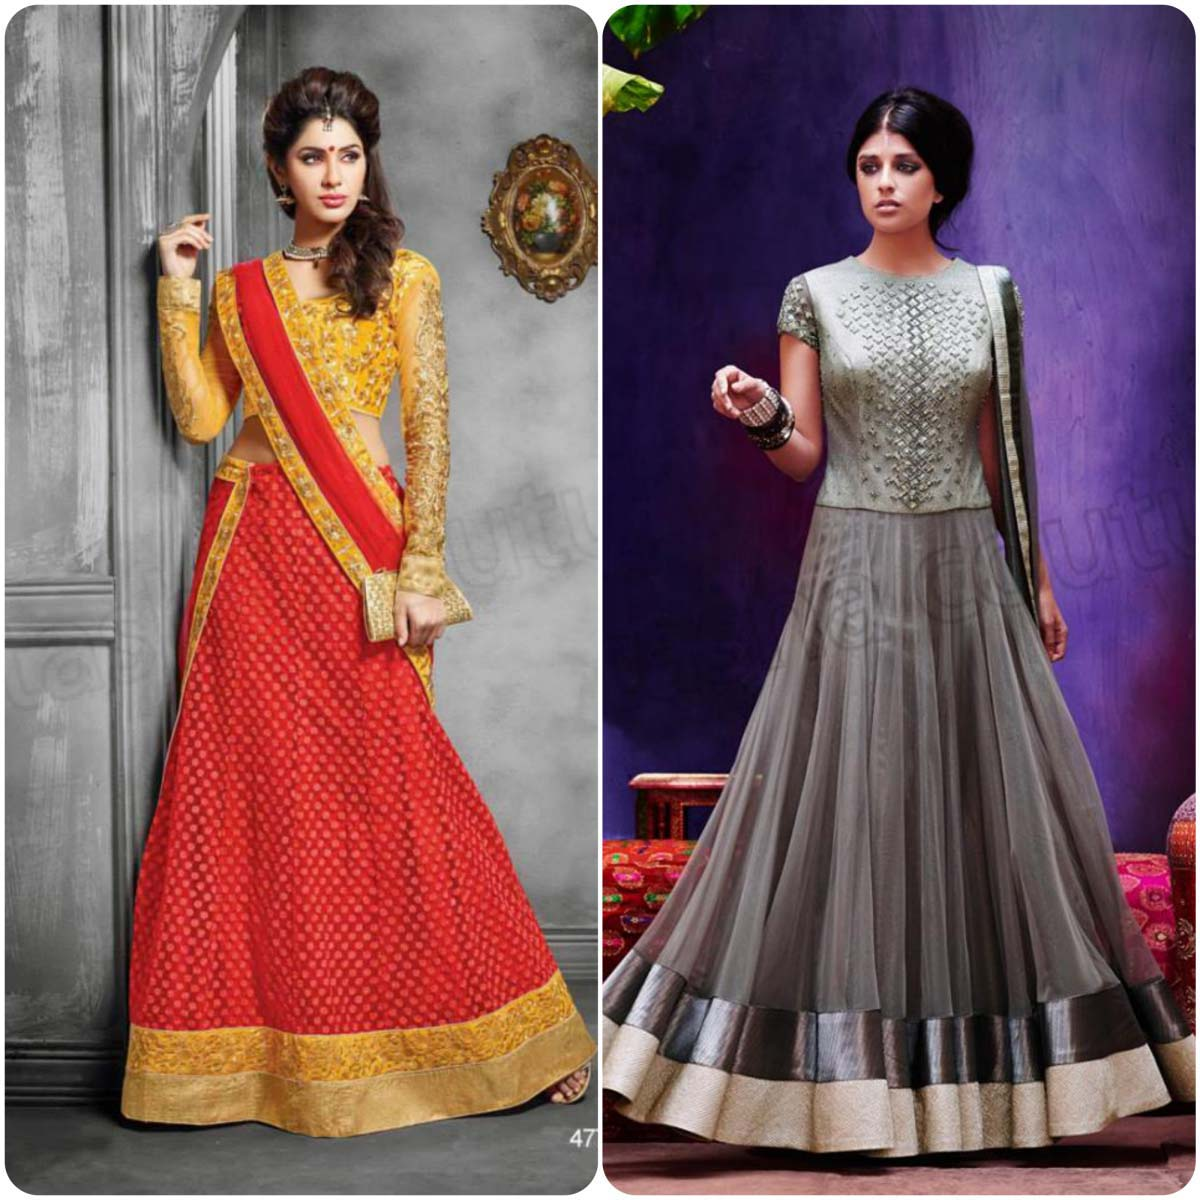 Natasha Couture Latest Indian Anarkali Dress Desigs Collection 2016-2017...styloplanet (16)